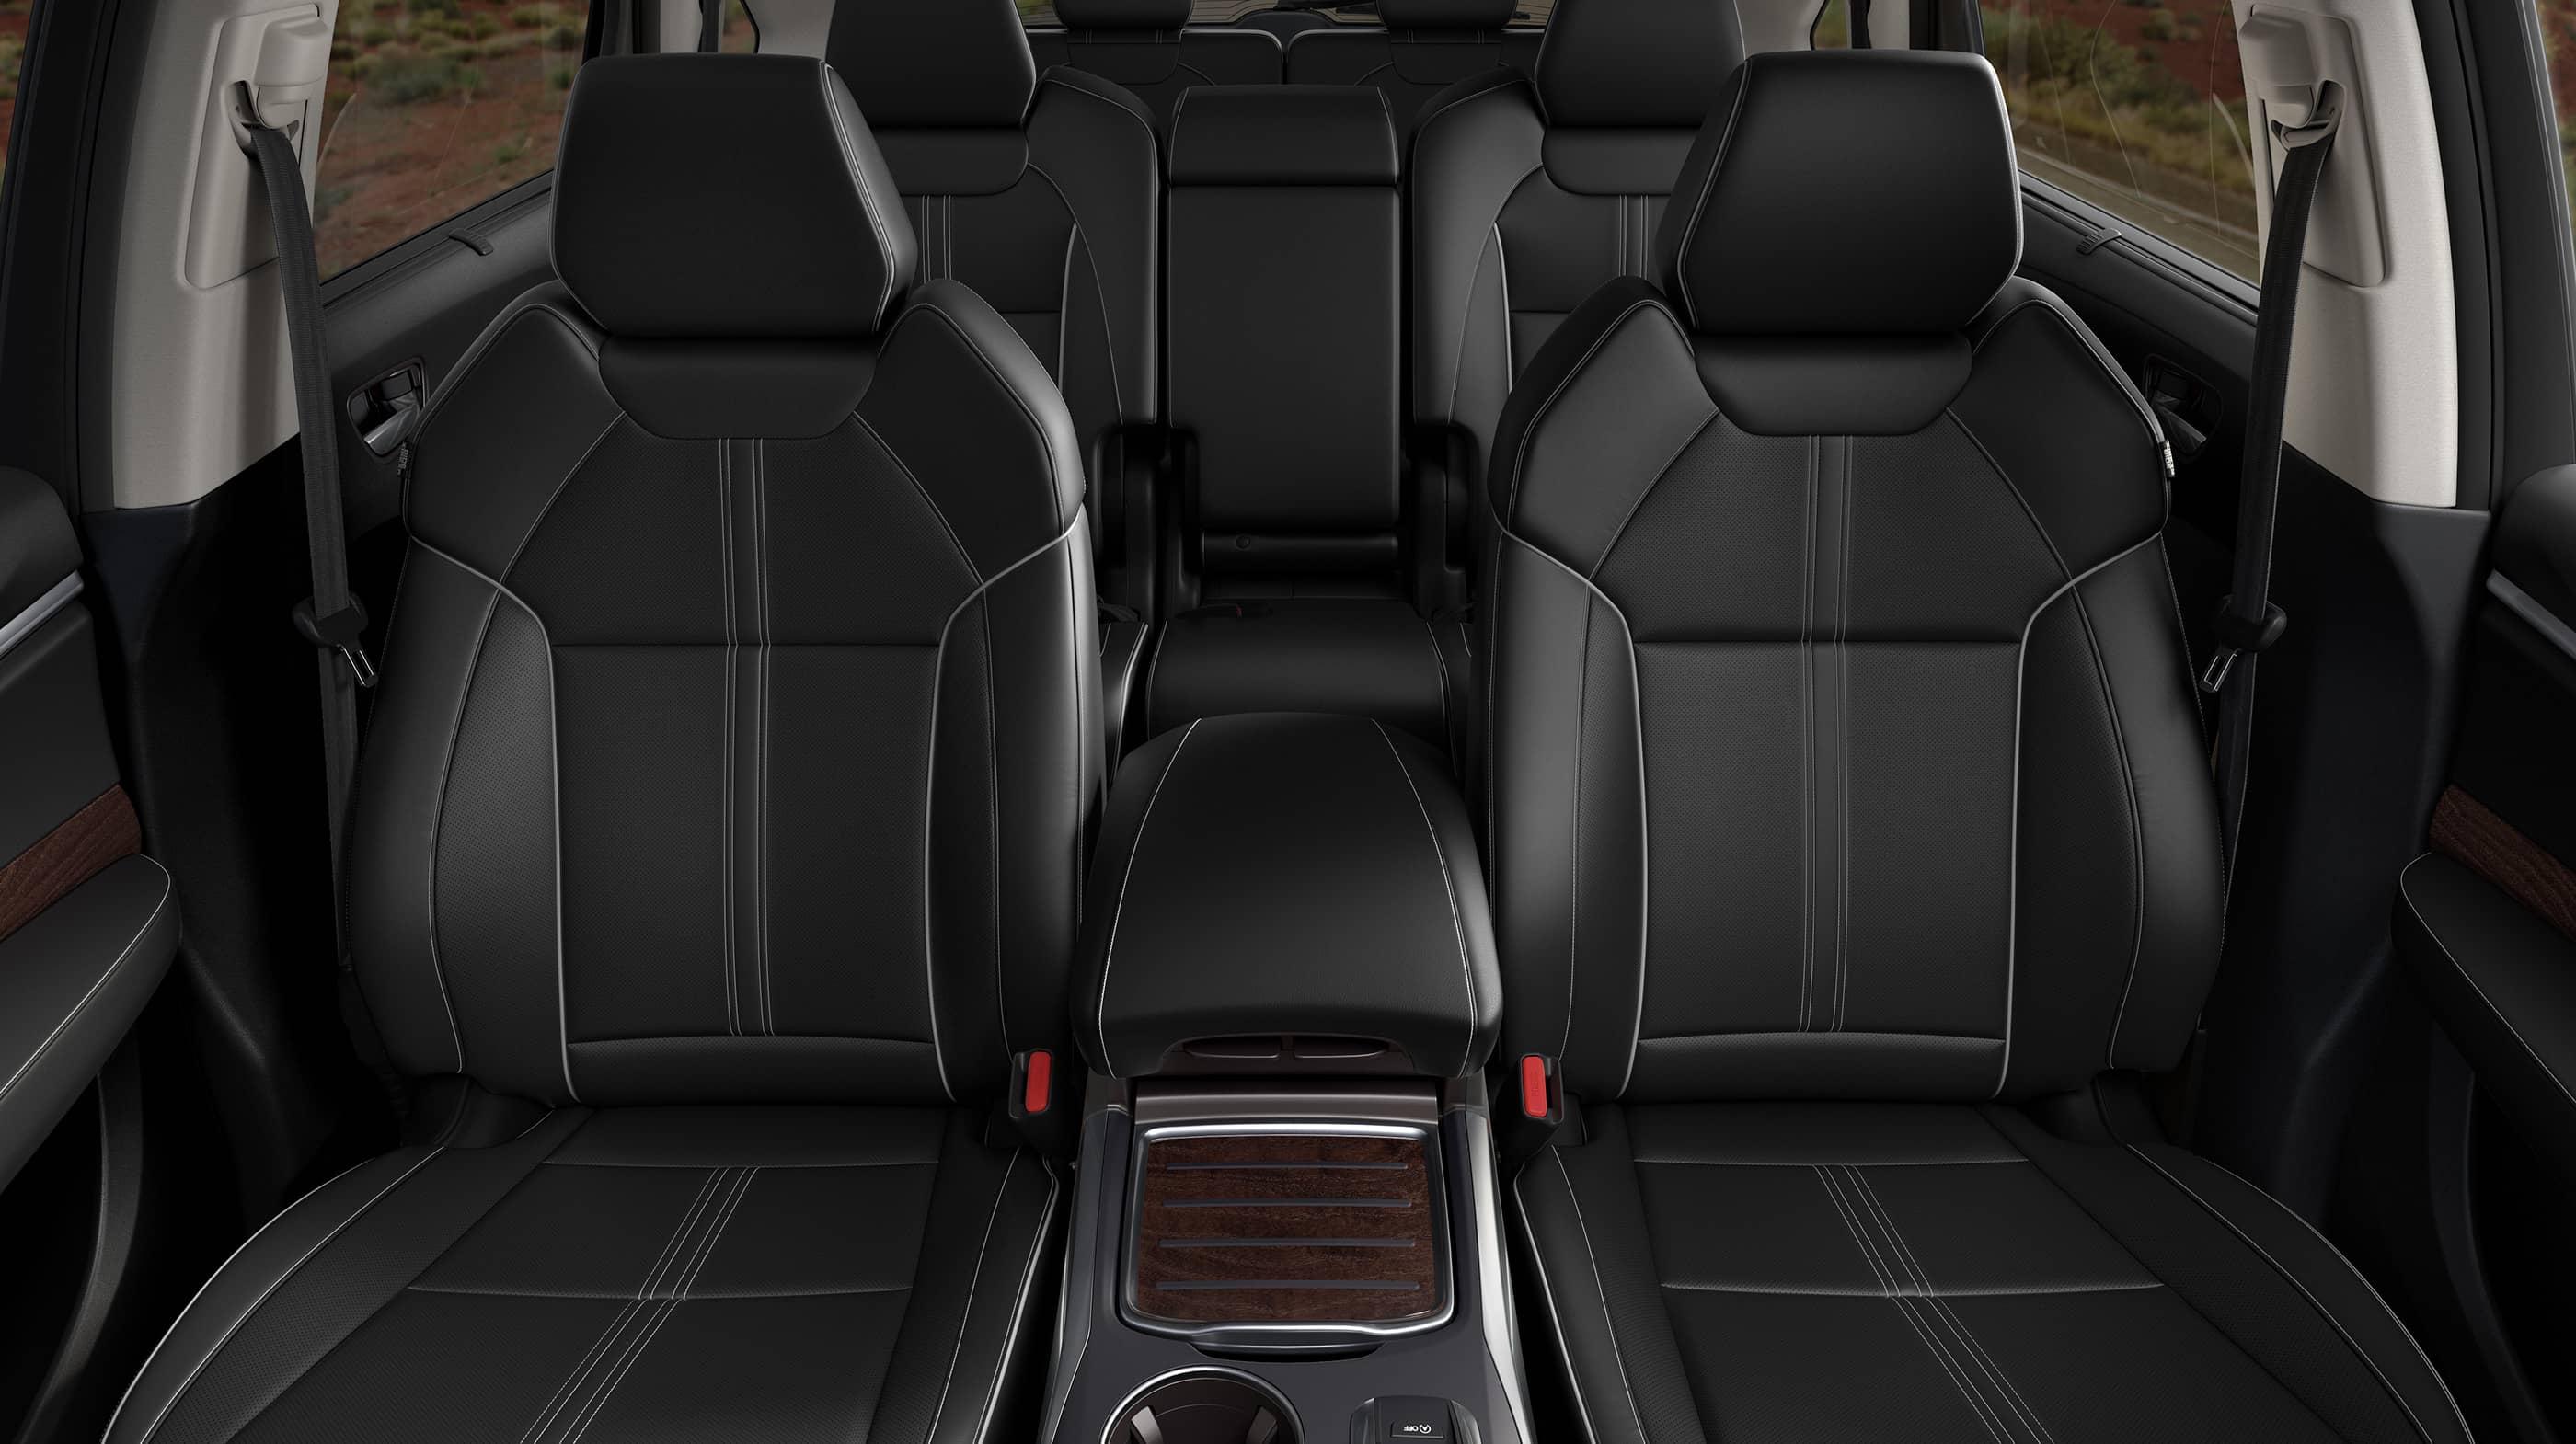 2017 Acura Mdx Sport Hybrid Ebony Leather Interior Seating Jpg